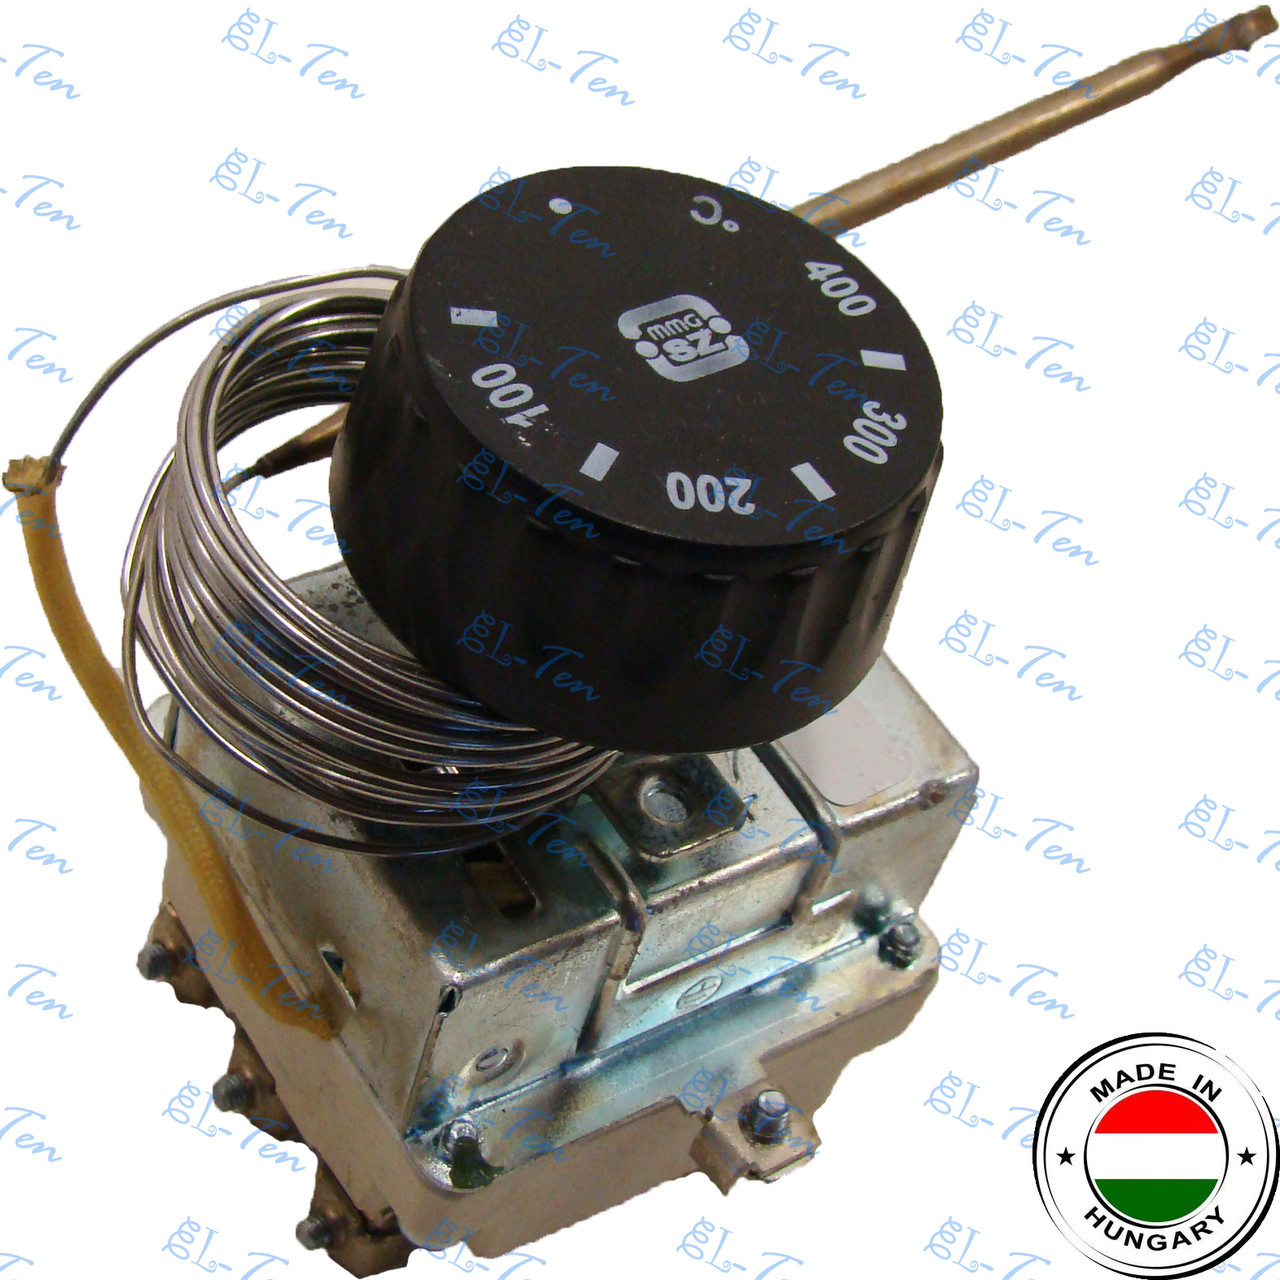 MMG 3/400*C термостат TC-1R31KM (Венгрия)